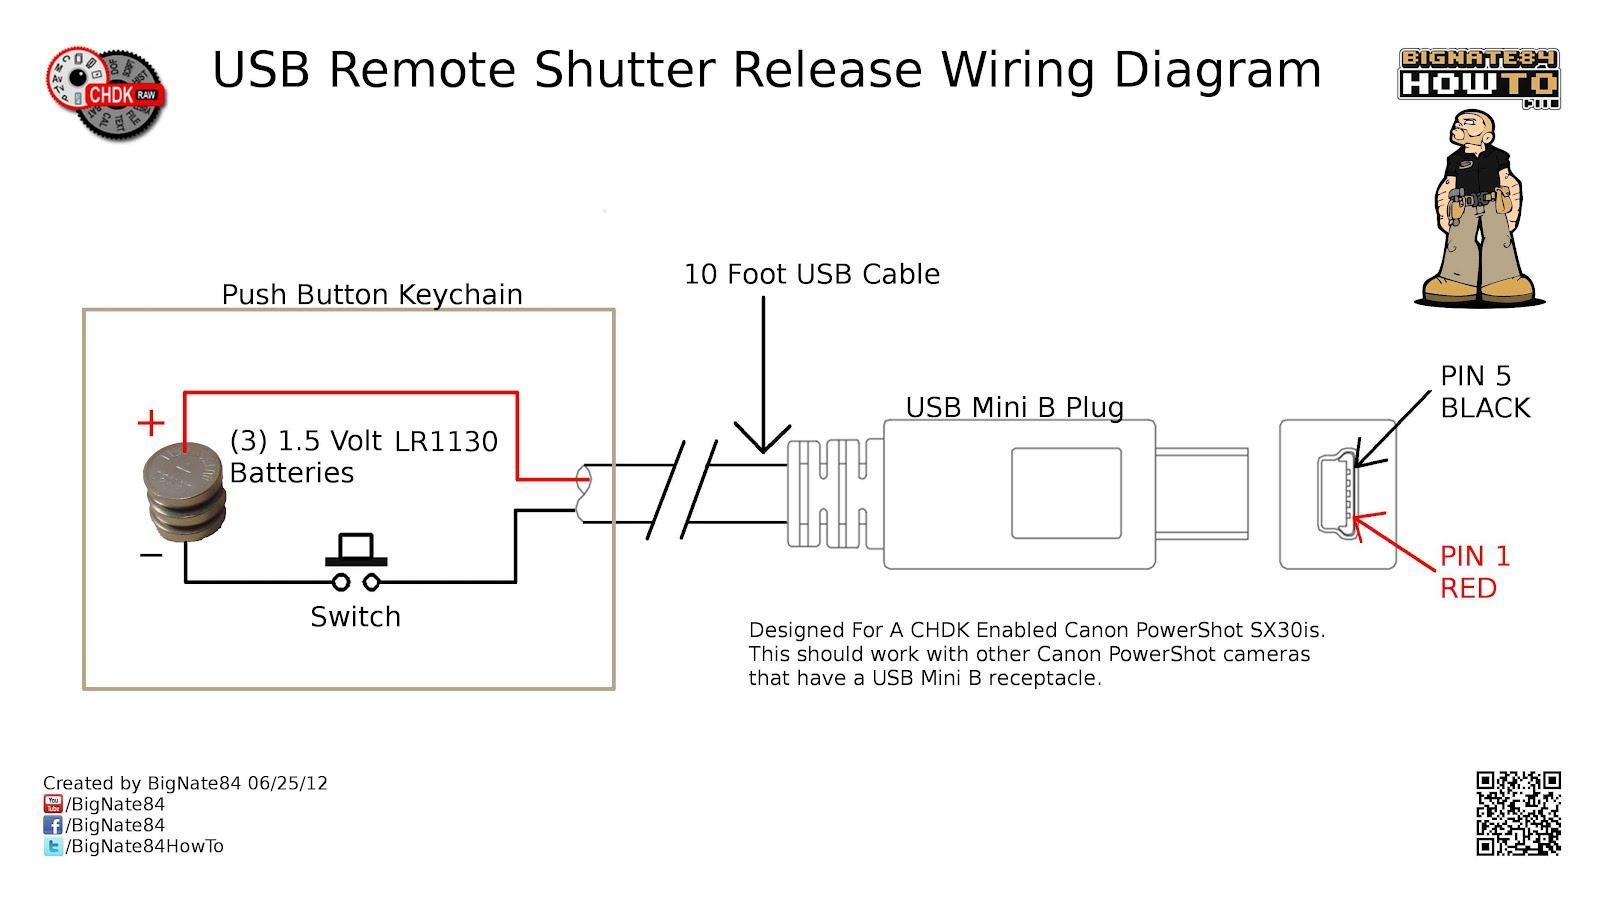 image 0001 usb remote shutter wiring diagram 3 chdk wiki image - 0001 usb remote shutter wiring diagram -1.jpeg ... remote starter wiring diagram for 2015 mazda 3 free download